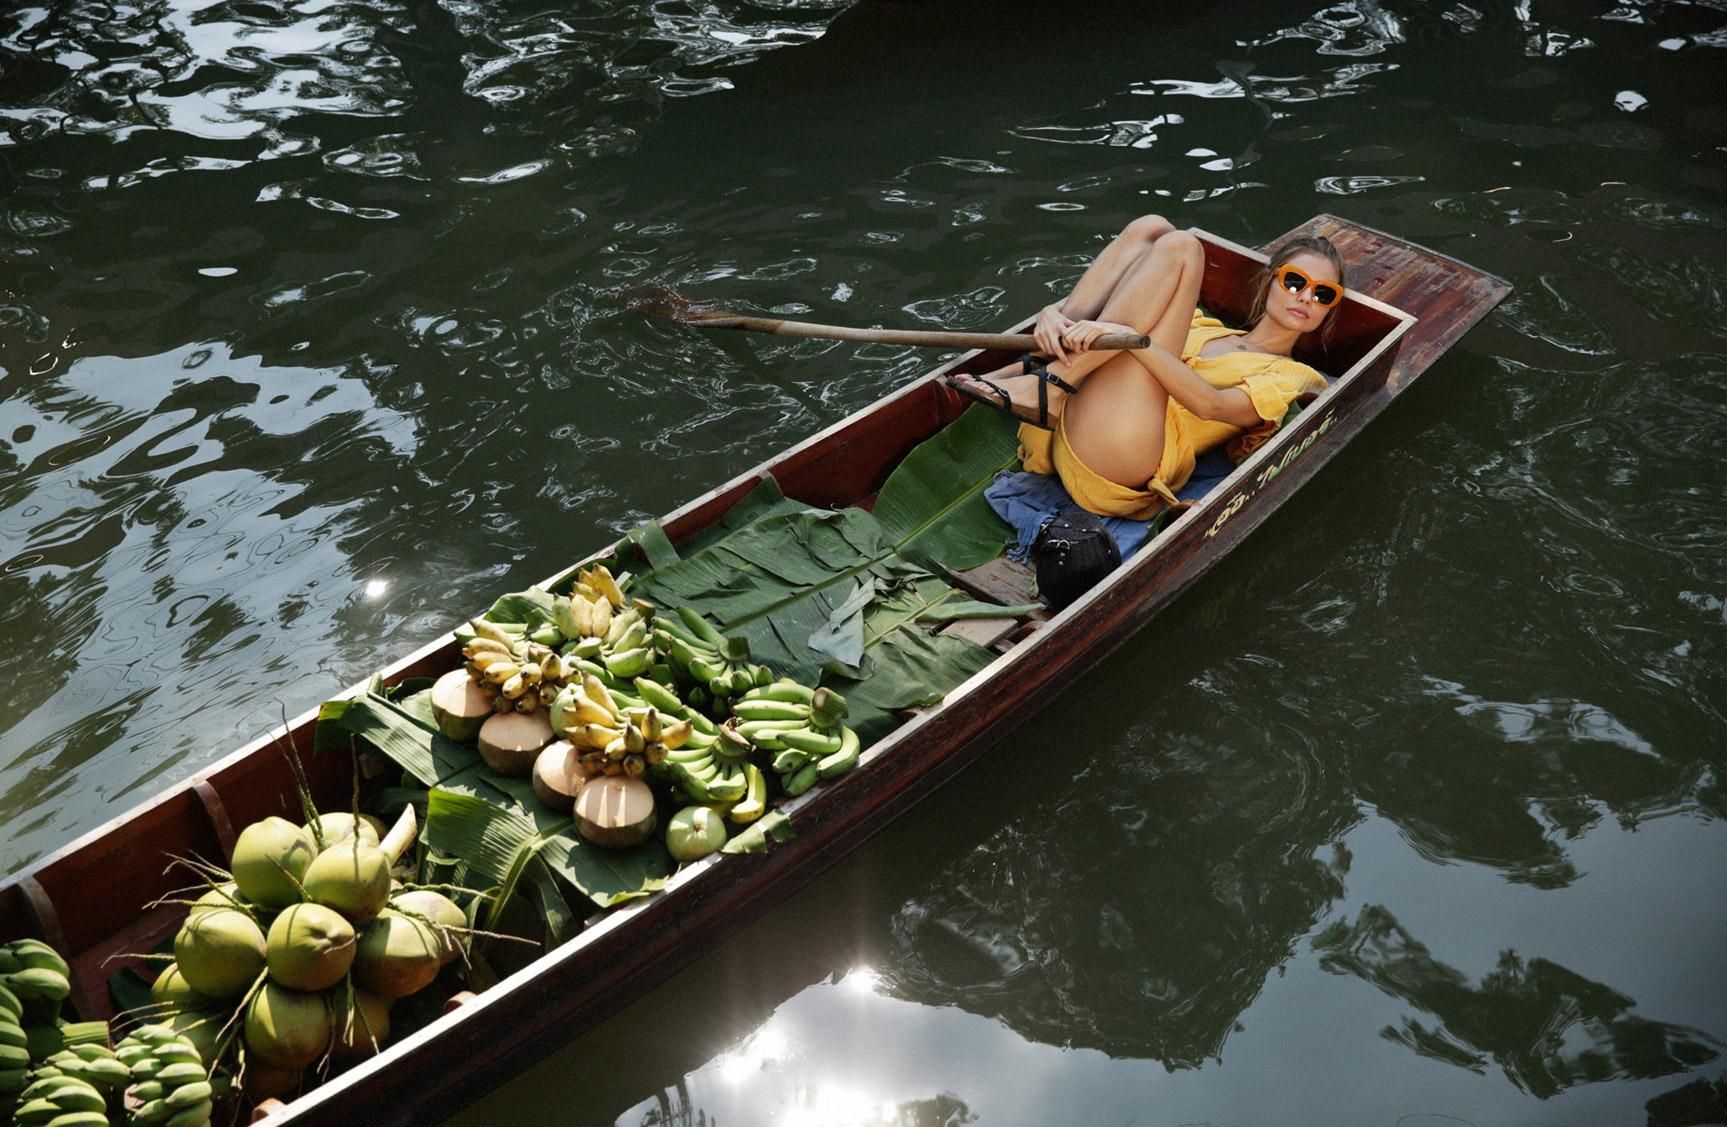 Отдых со слонами в Таиланде - Магдалена Фраковяк / Magdalena Frackowiak by Cameron Hammond / Free People